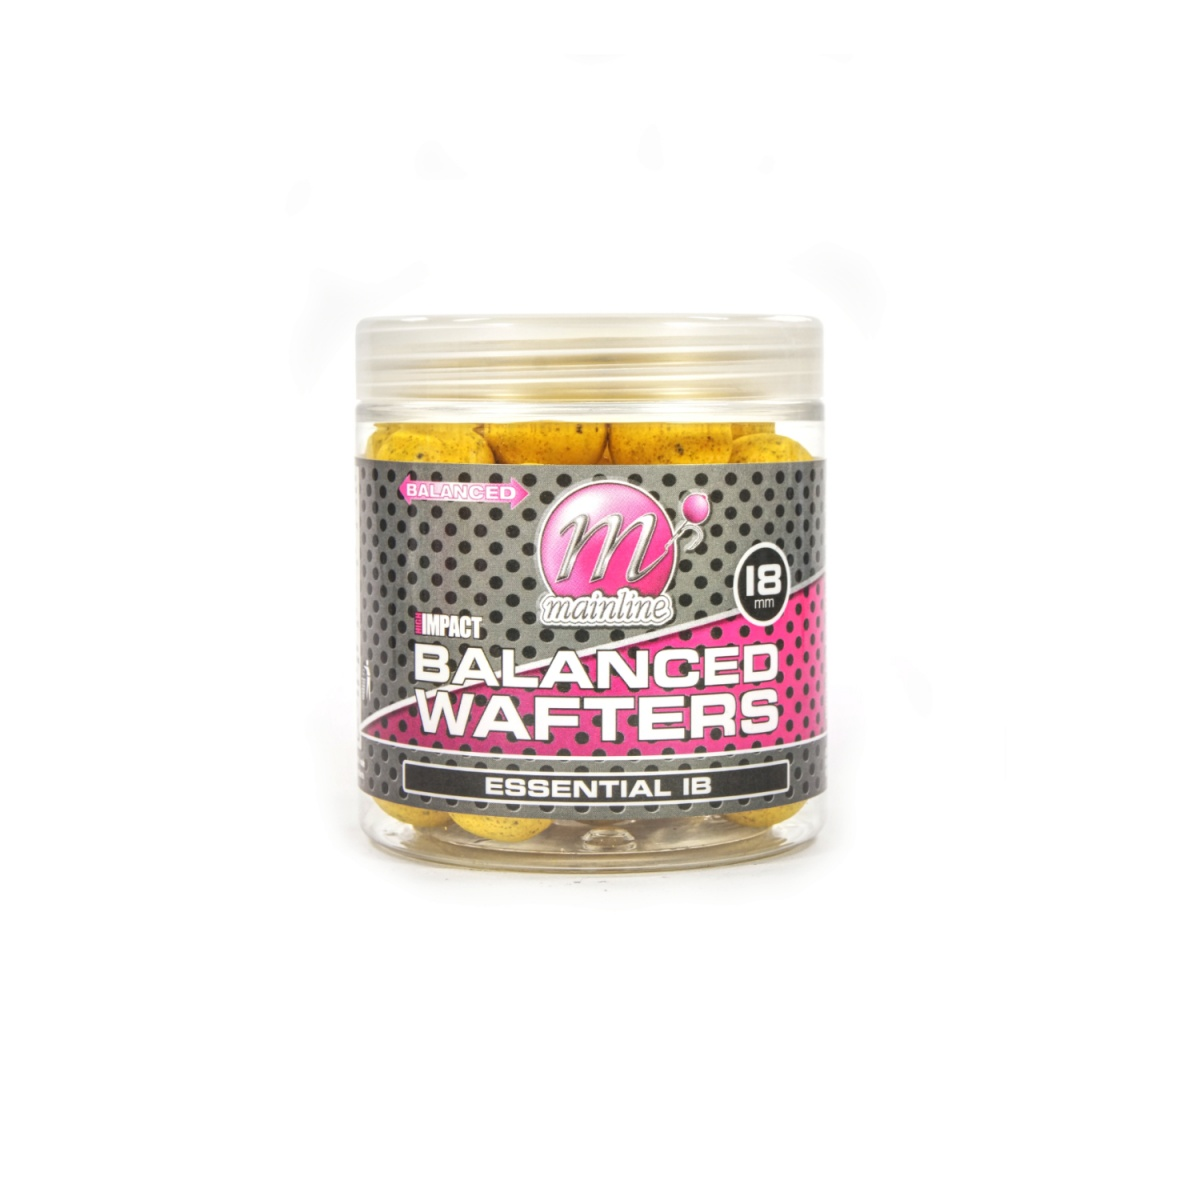 Mainline Balanced Wafters Essential IB rozmiar 18mm